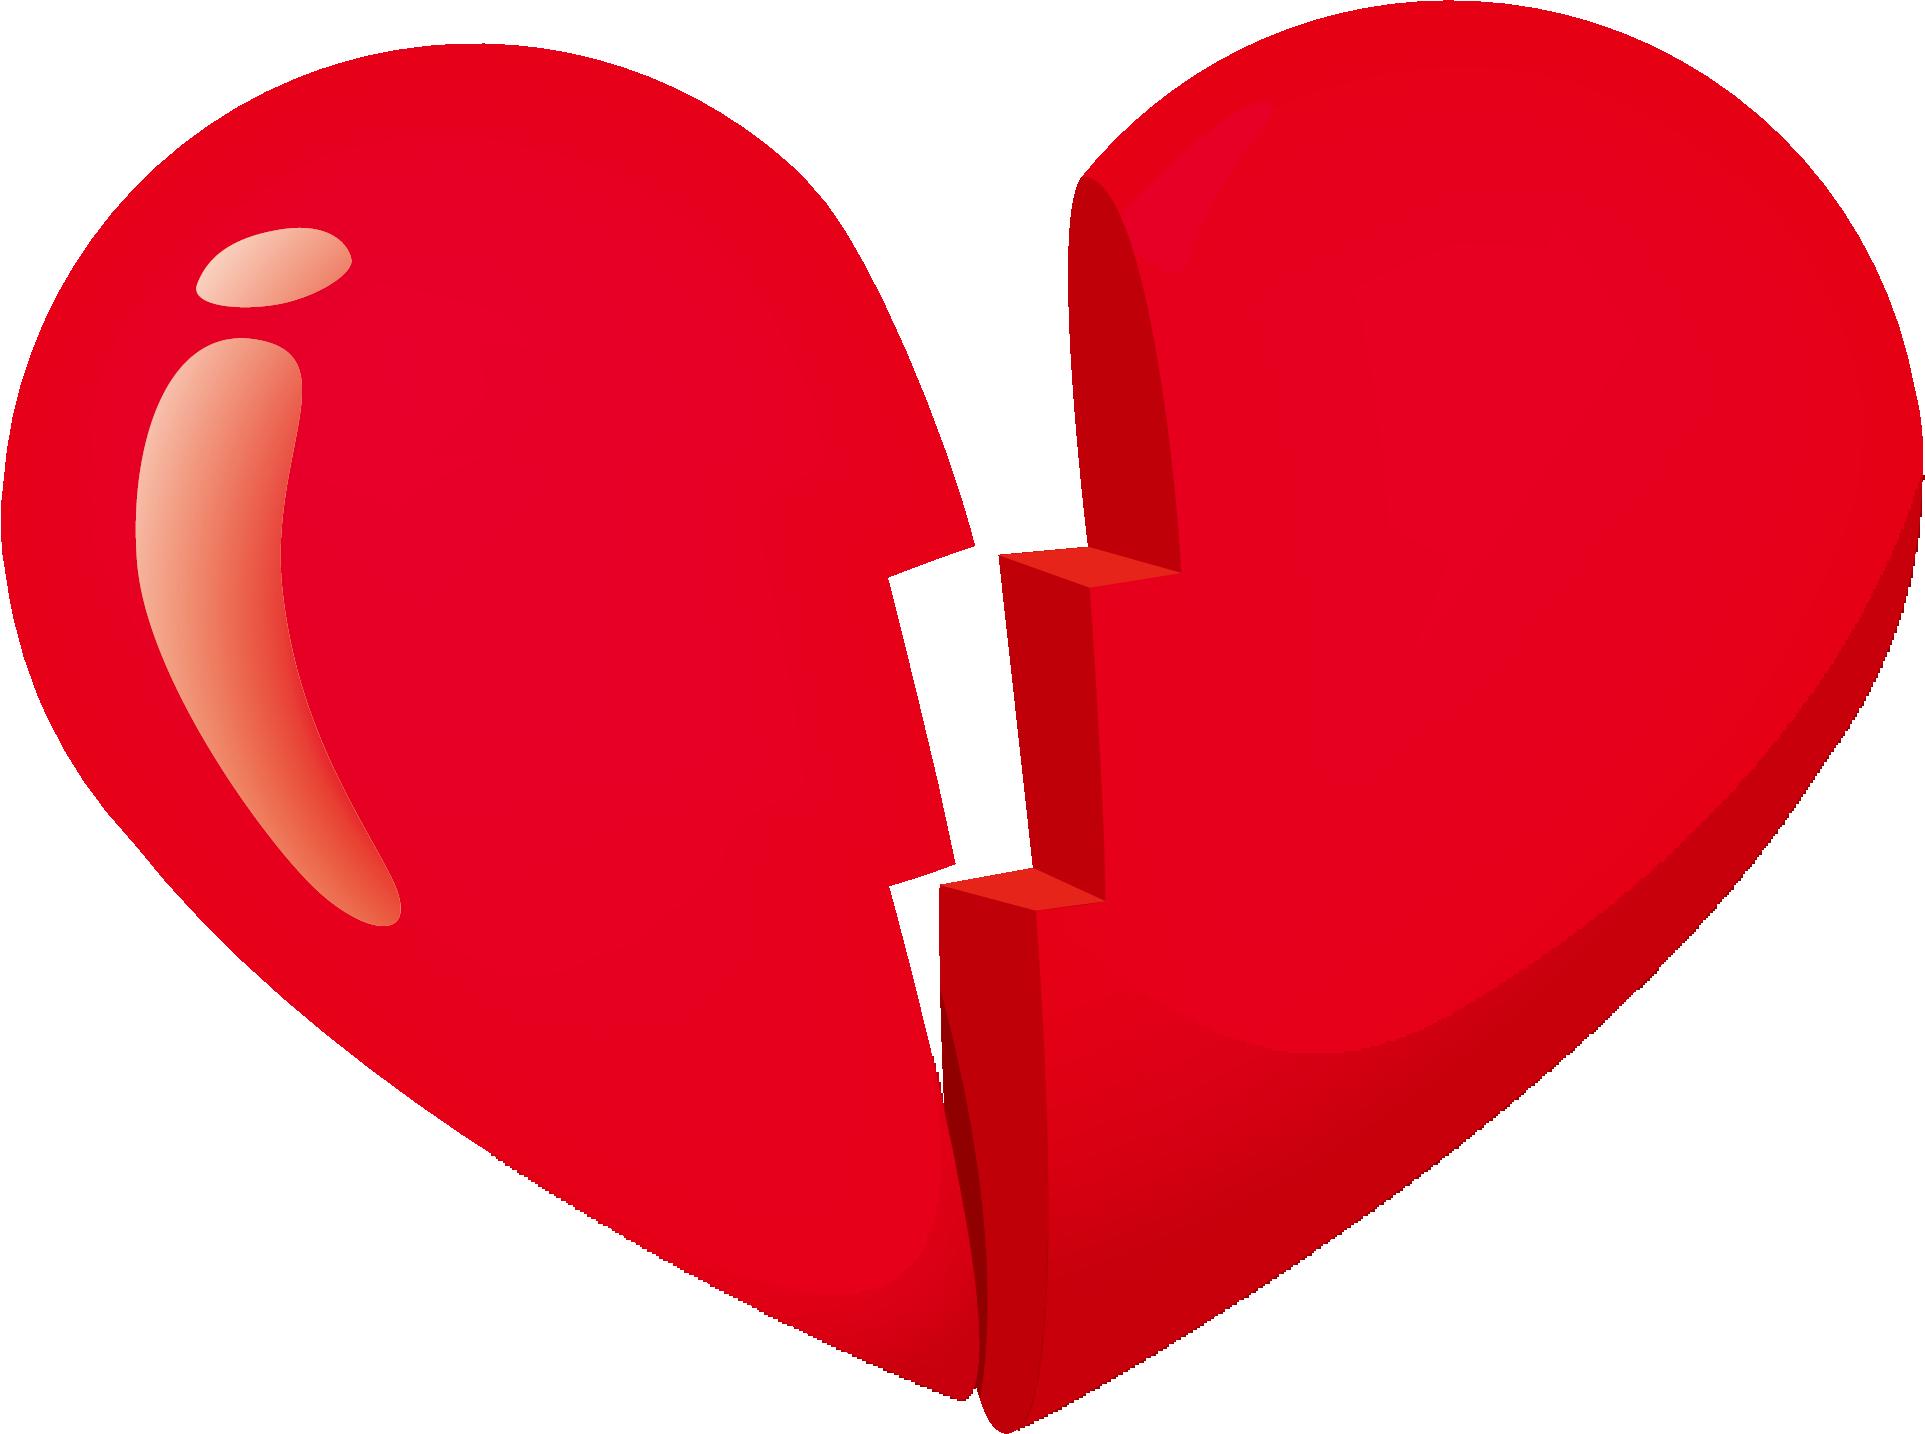 Broken Heart Clipart Png.